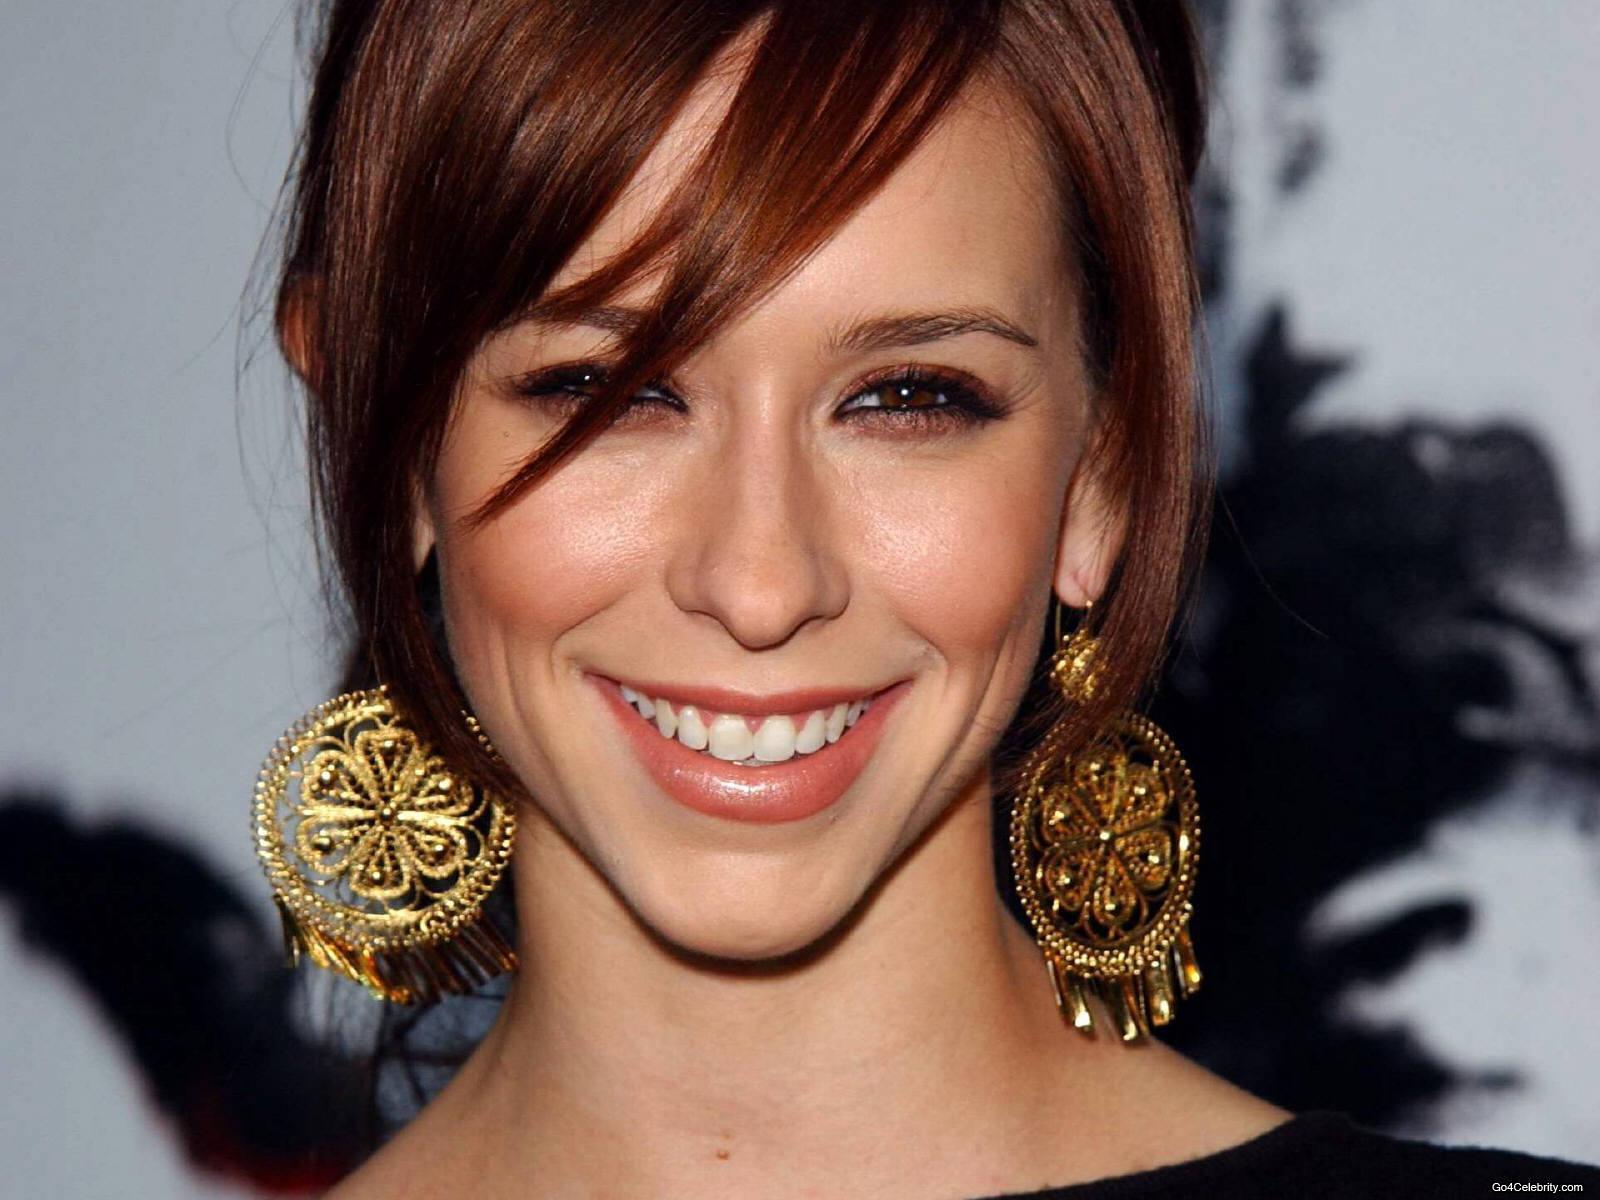 http://1.bp.blogspot.com/-37OMBOUBV9k/UNtU_QZ0KLI/AAAAAAAACLk/qXlOAjKvIjA/s1600/Jennifer-jennifer-love-hewitt-6836778-1600-1200.jpg